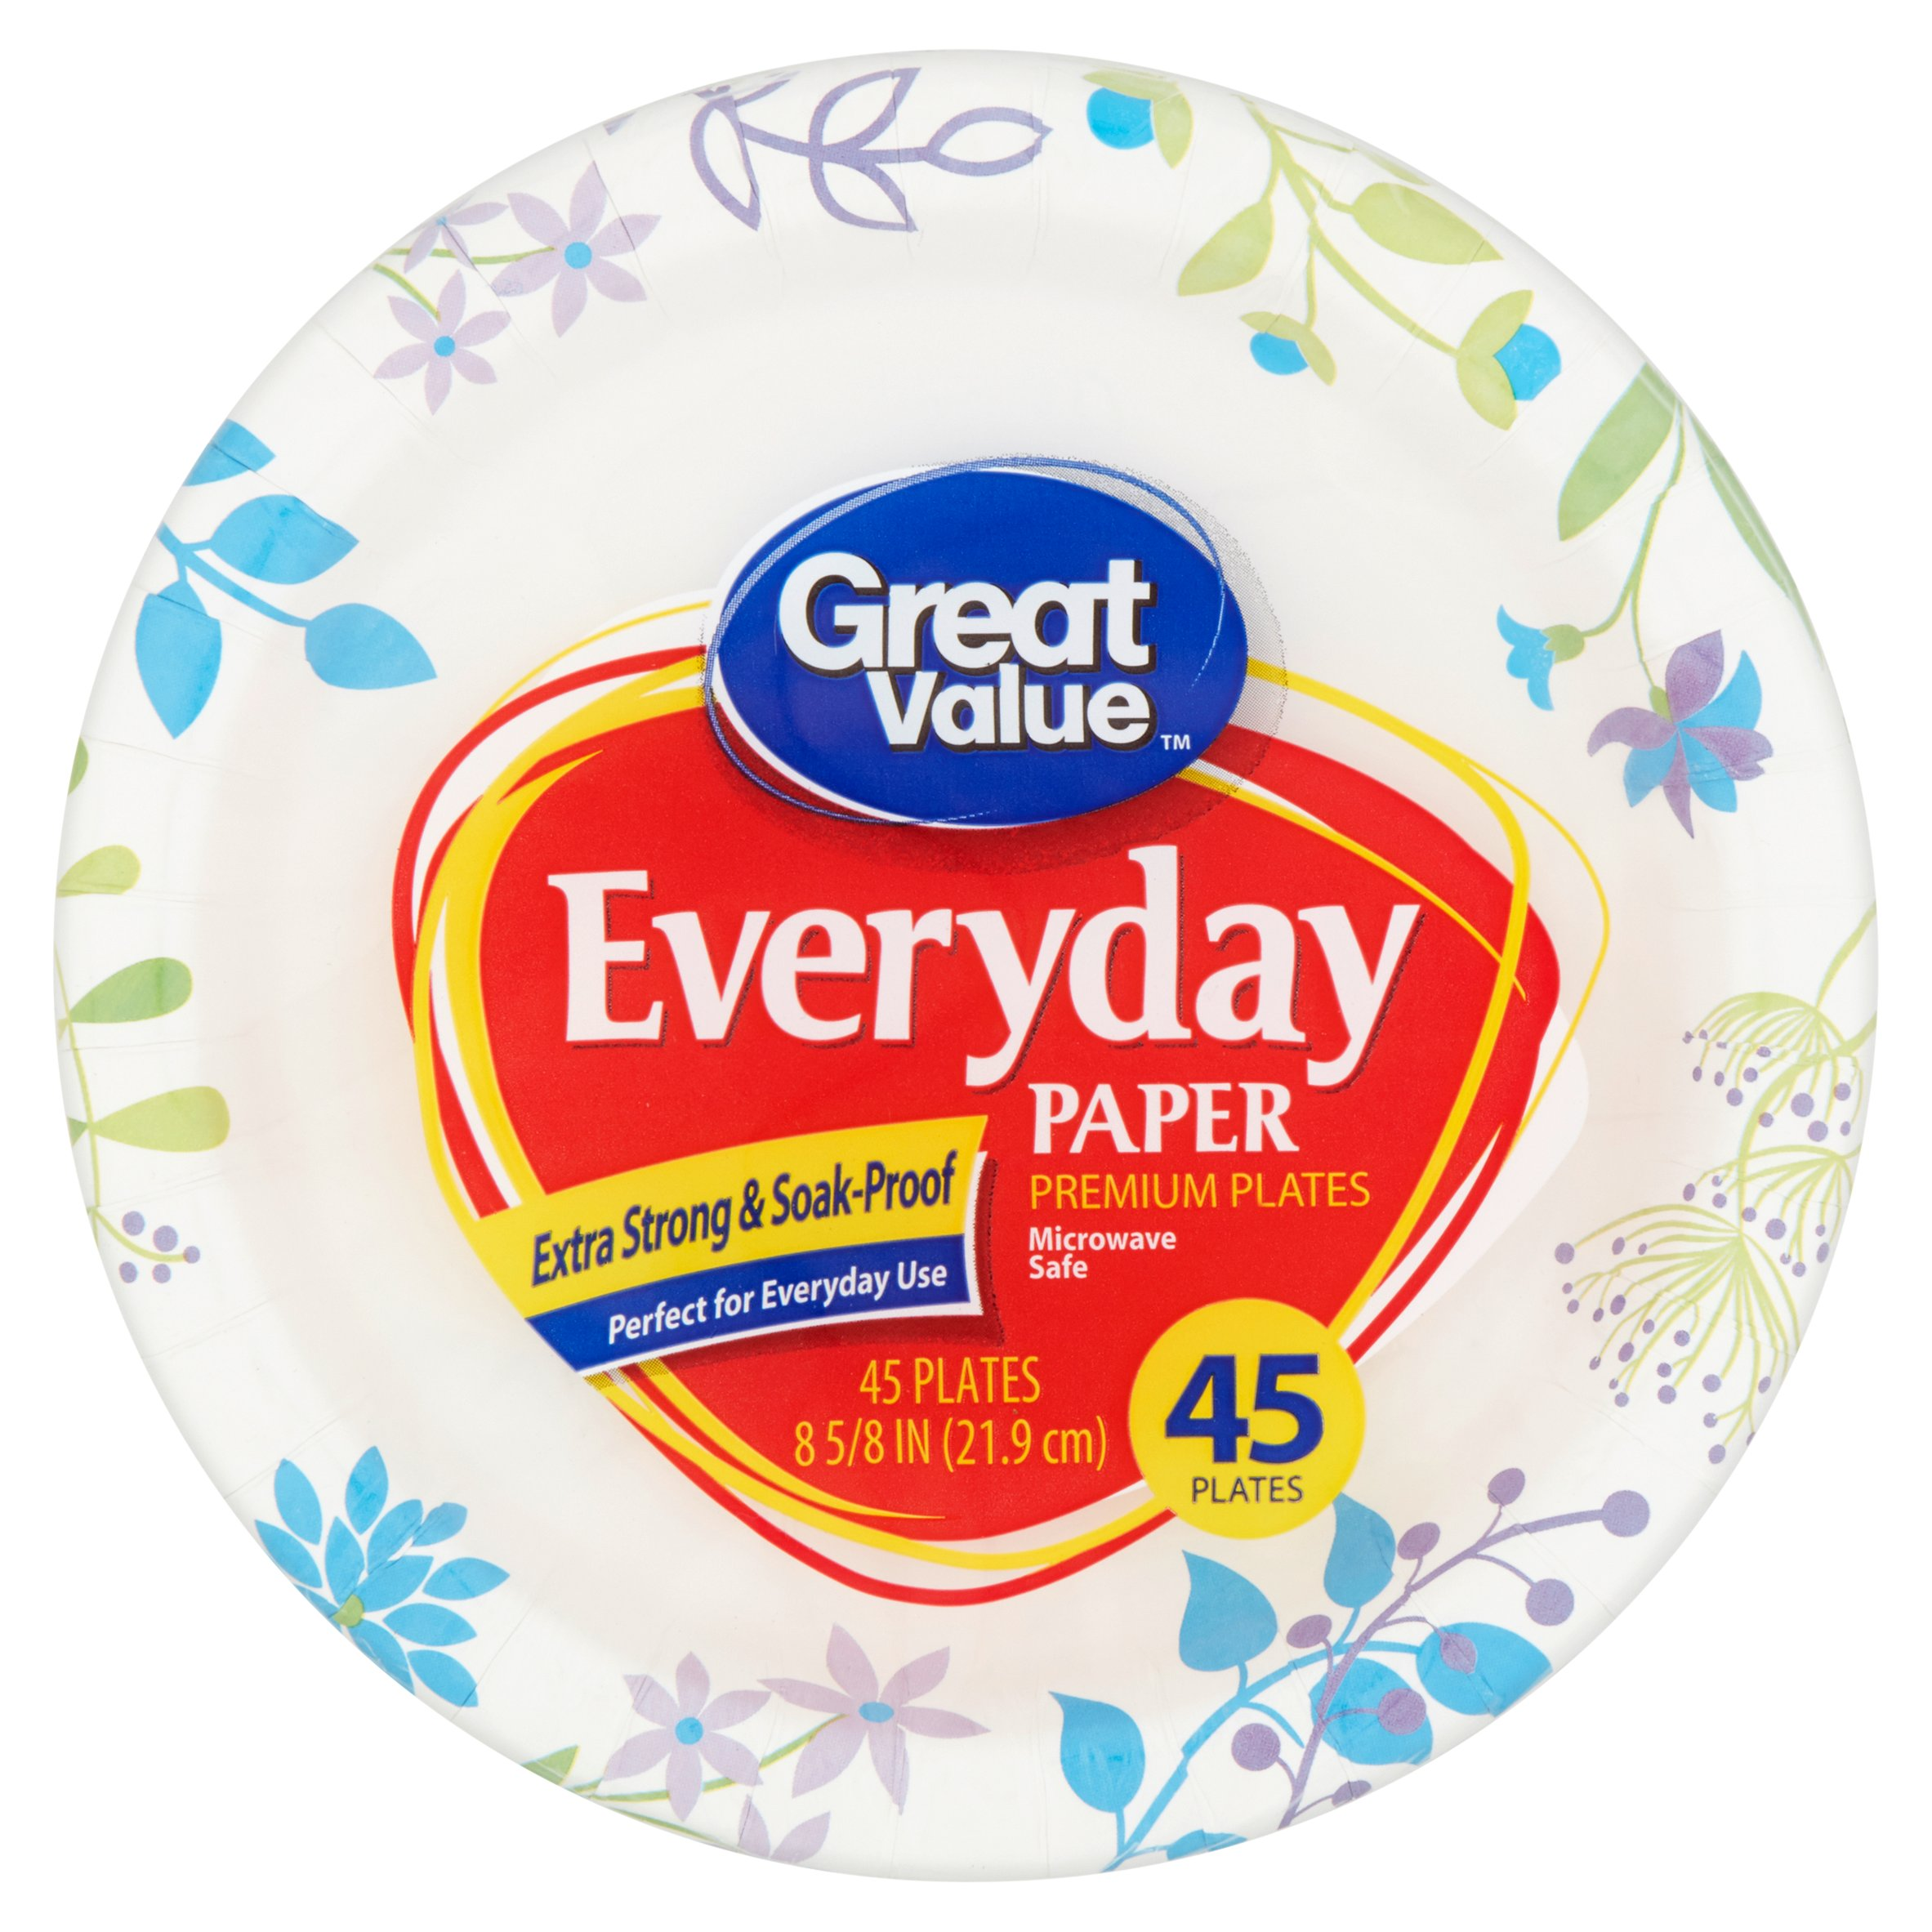 "Great Value Everyday Premium Paper Plates, 8 5/8"", 45 Count"